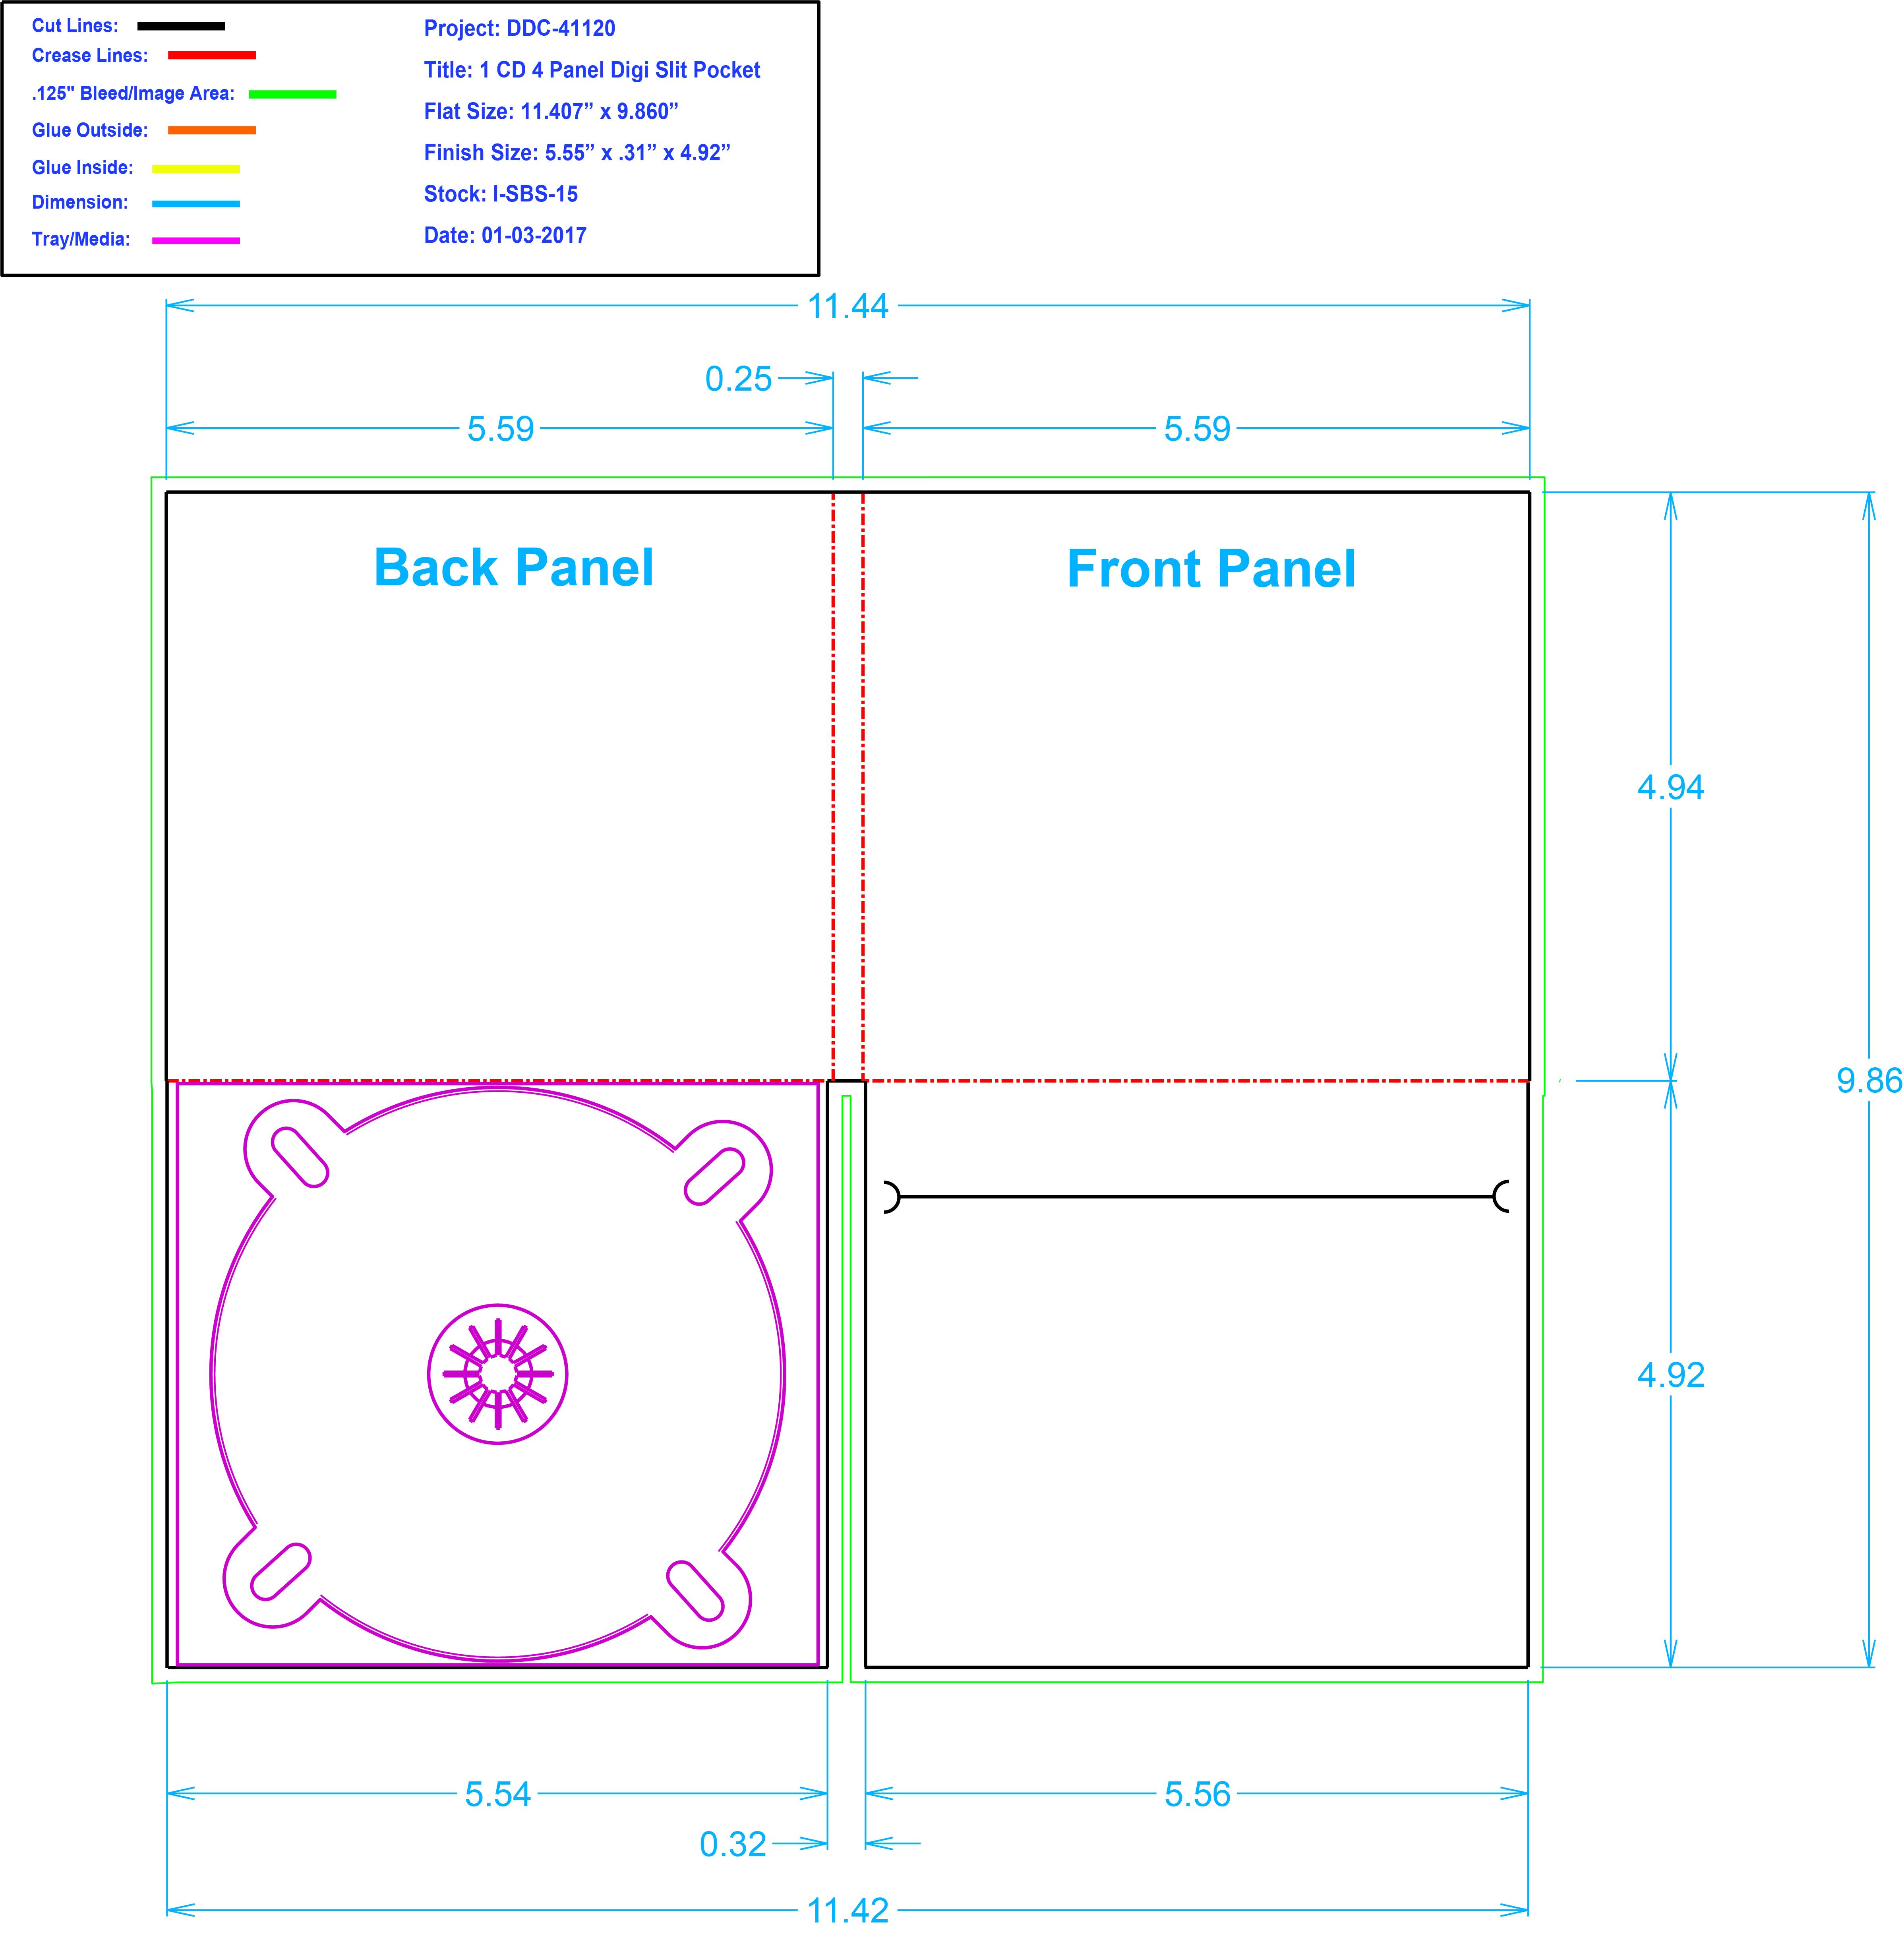 DDC41120 4 Panel Digi 1 Tray, Slit Pocket